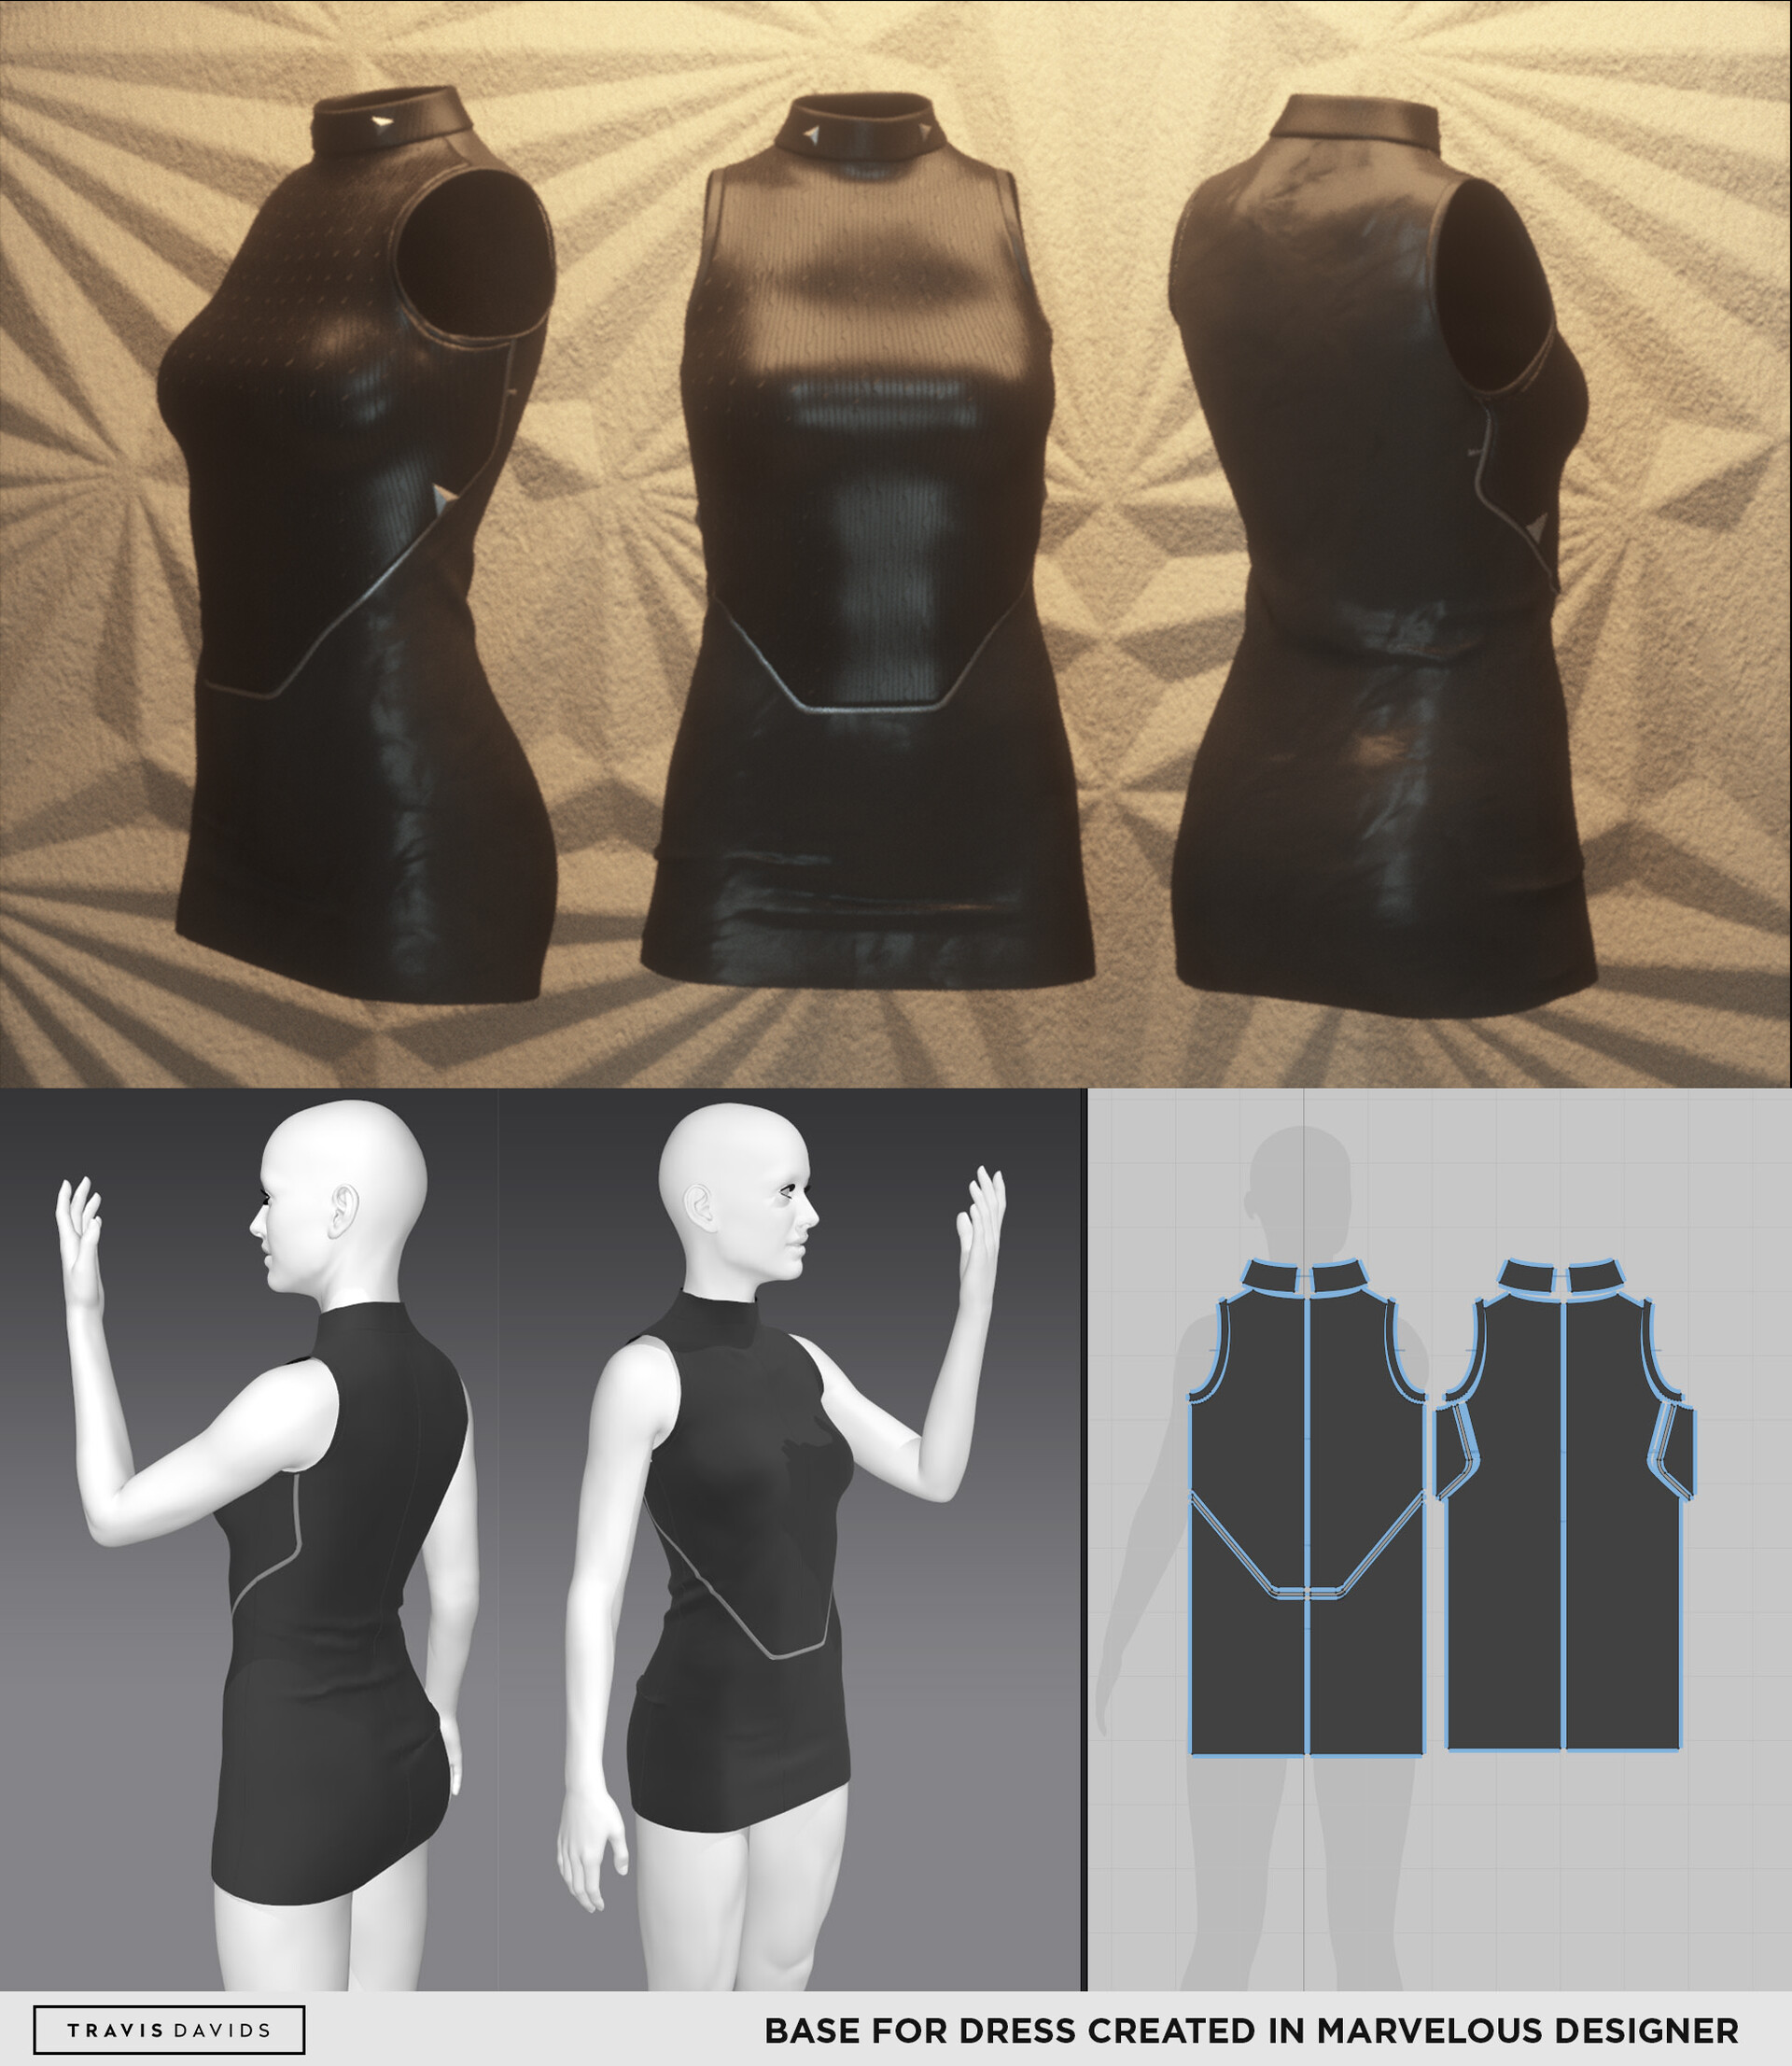 Marvelous Designer is my go-to for garment creation.